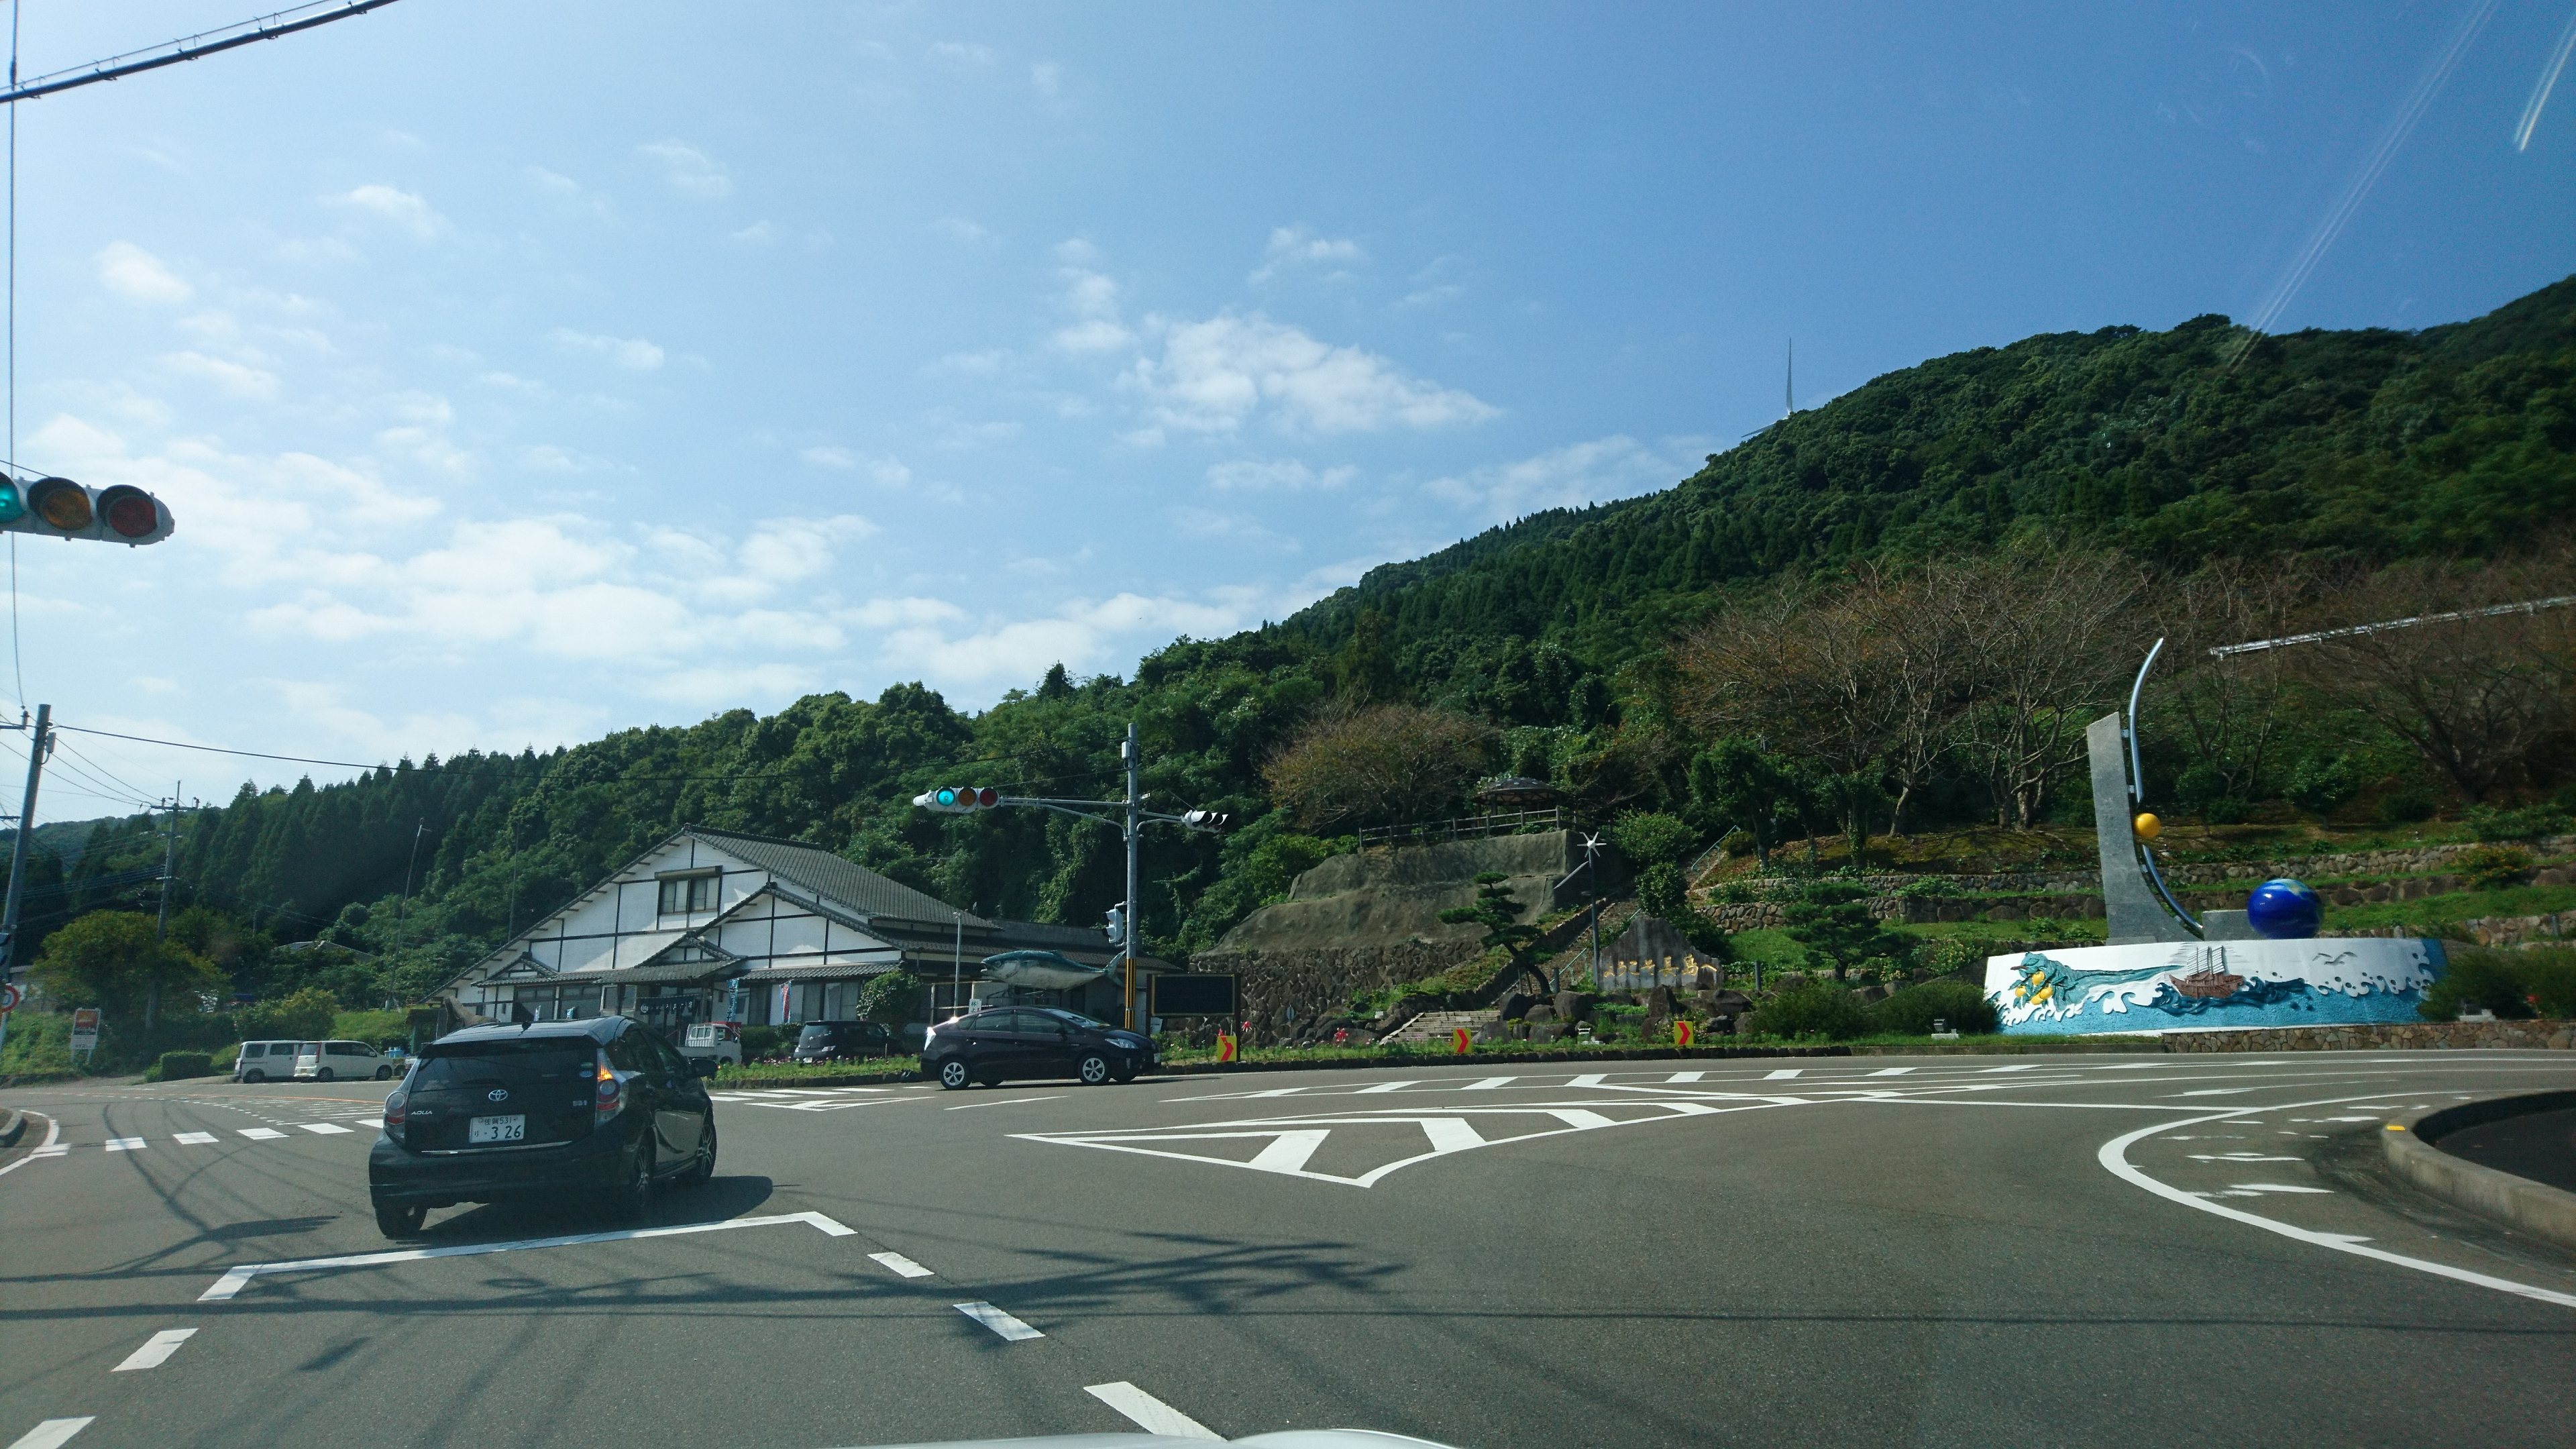 http://hashiguchi-seikotu.com/blog/about/%E9%95%B7%E5%B3%B6%E7%94%BA%E5%8F%B3%E6%8A%98.JPG